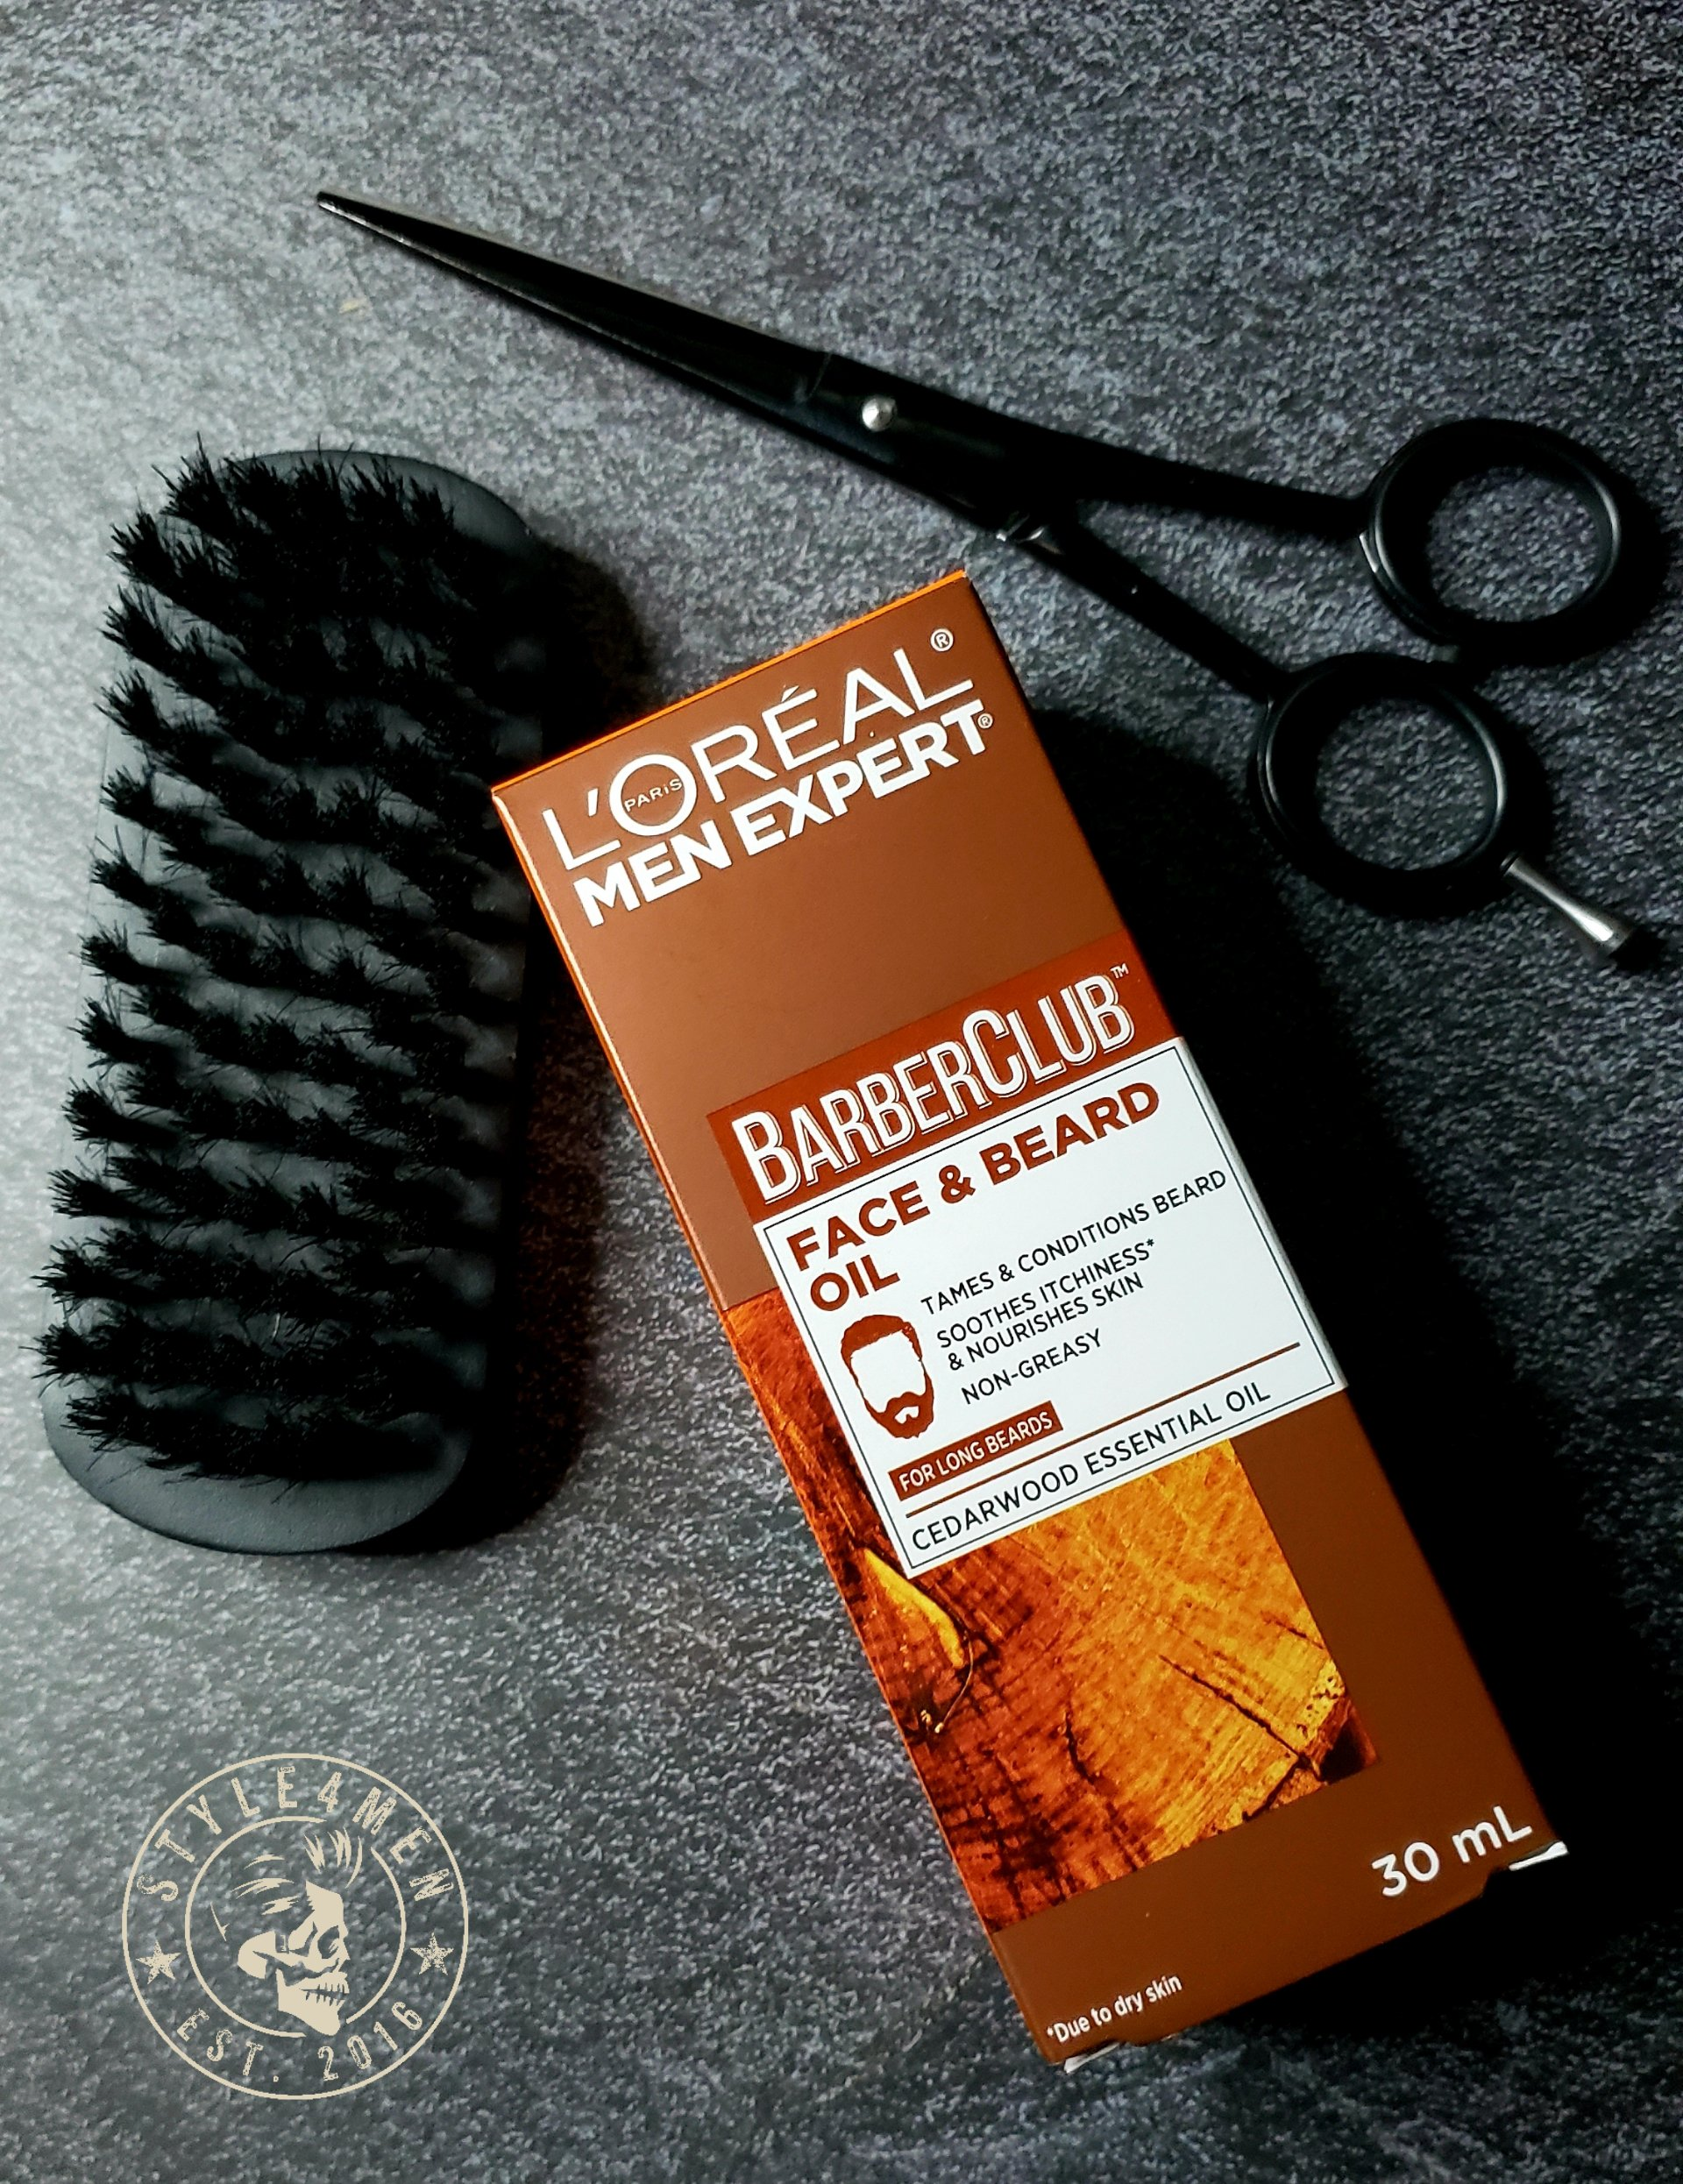 L'Oréal MEN EXPERT Face & Beard Oil